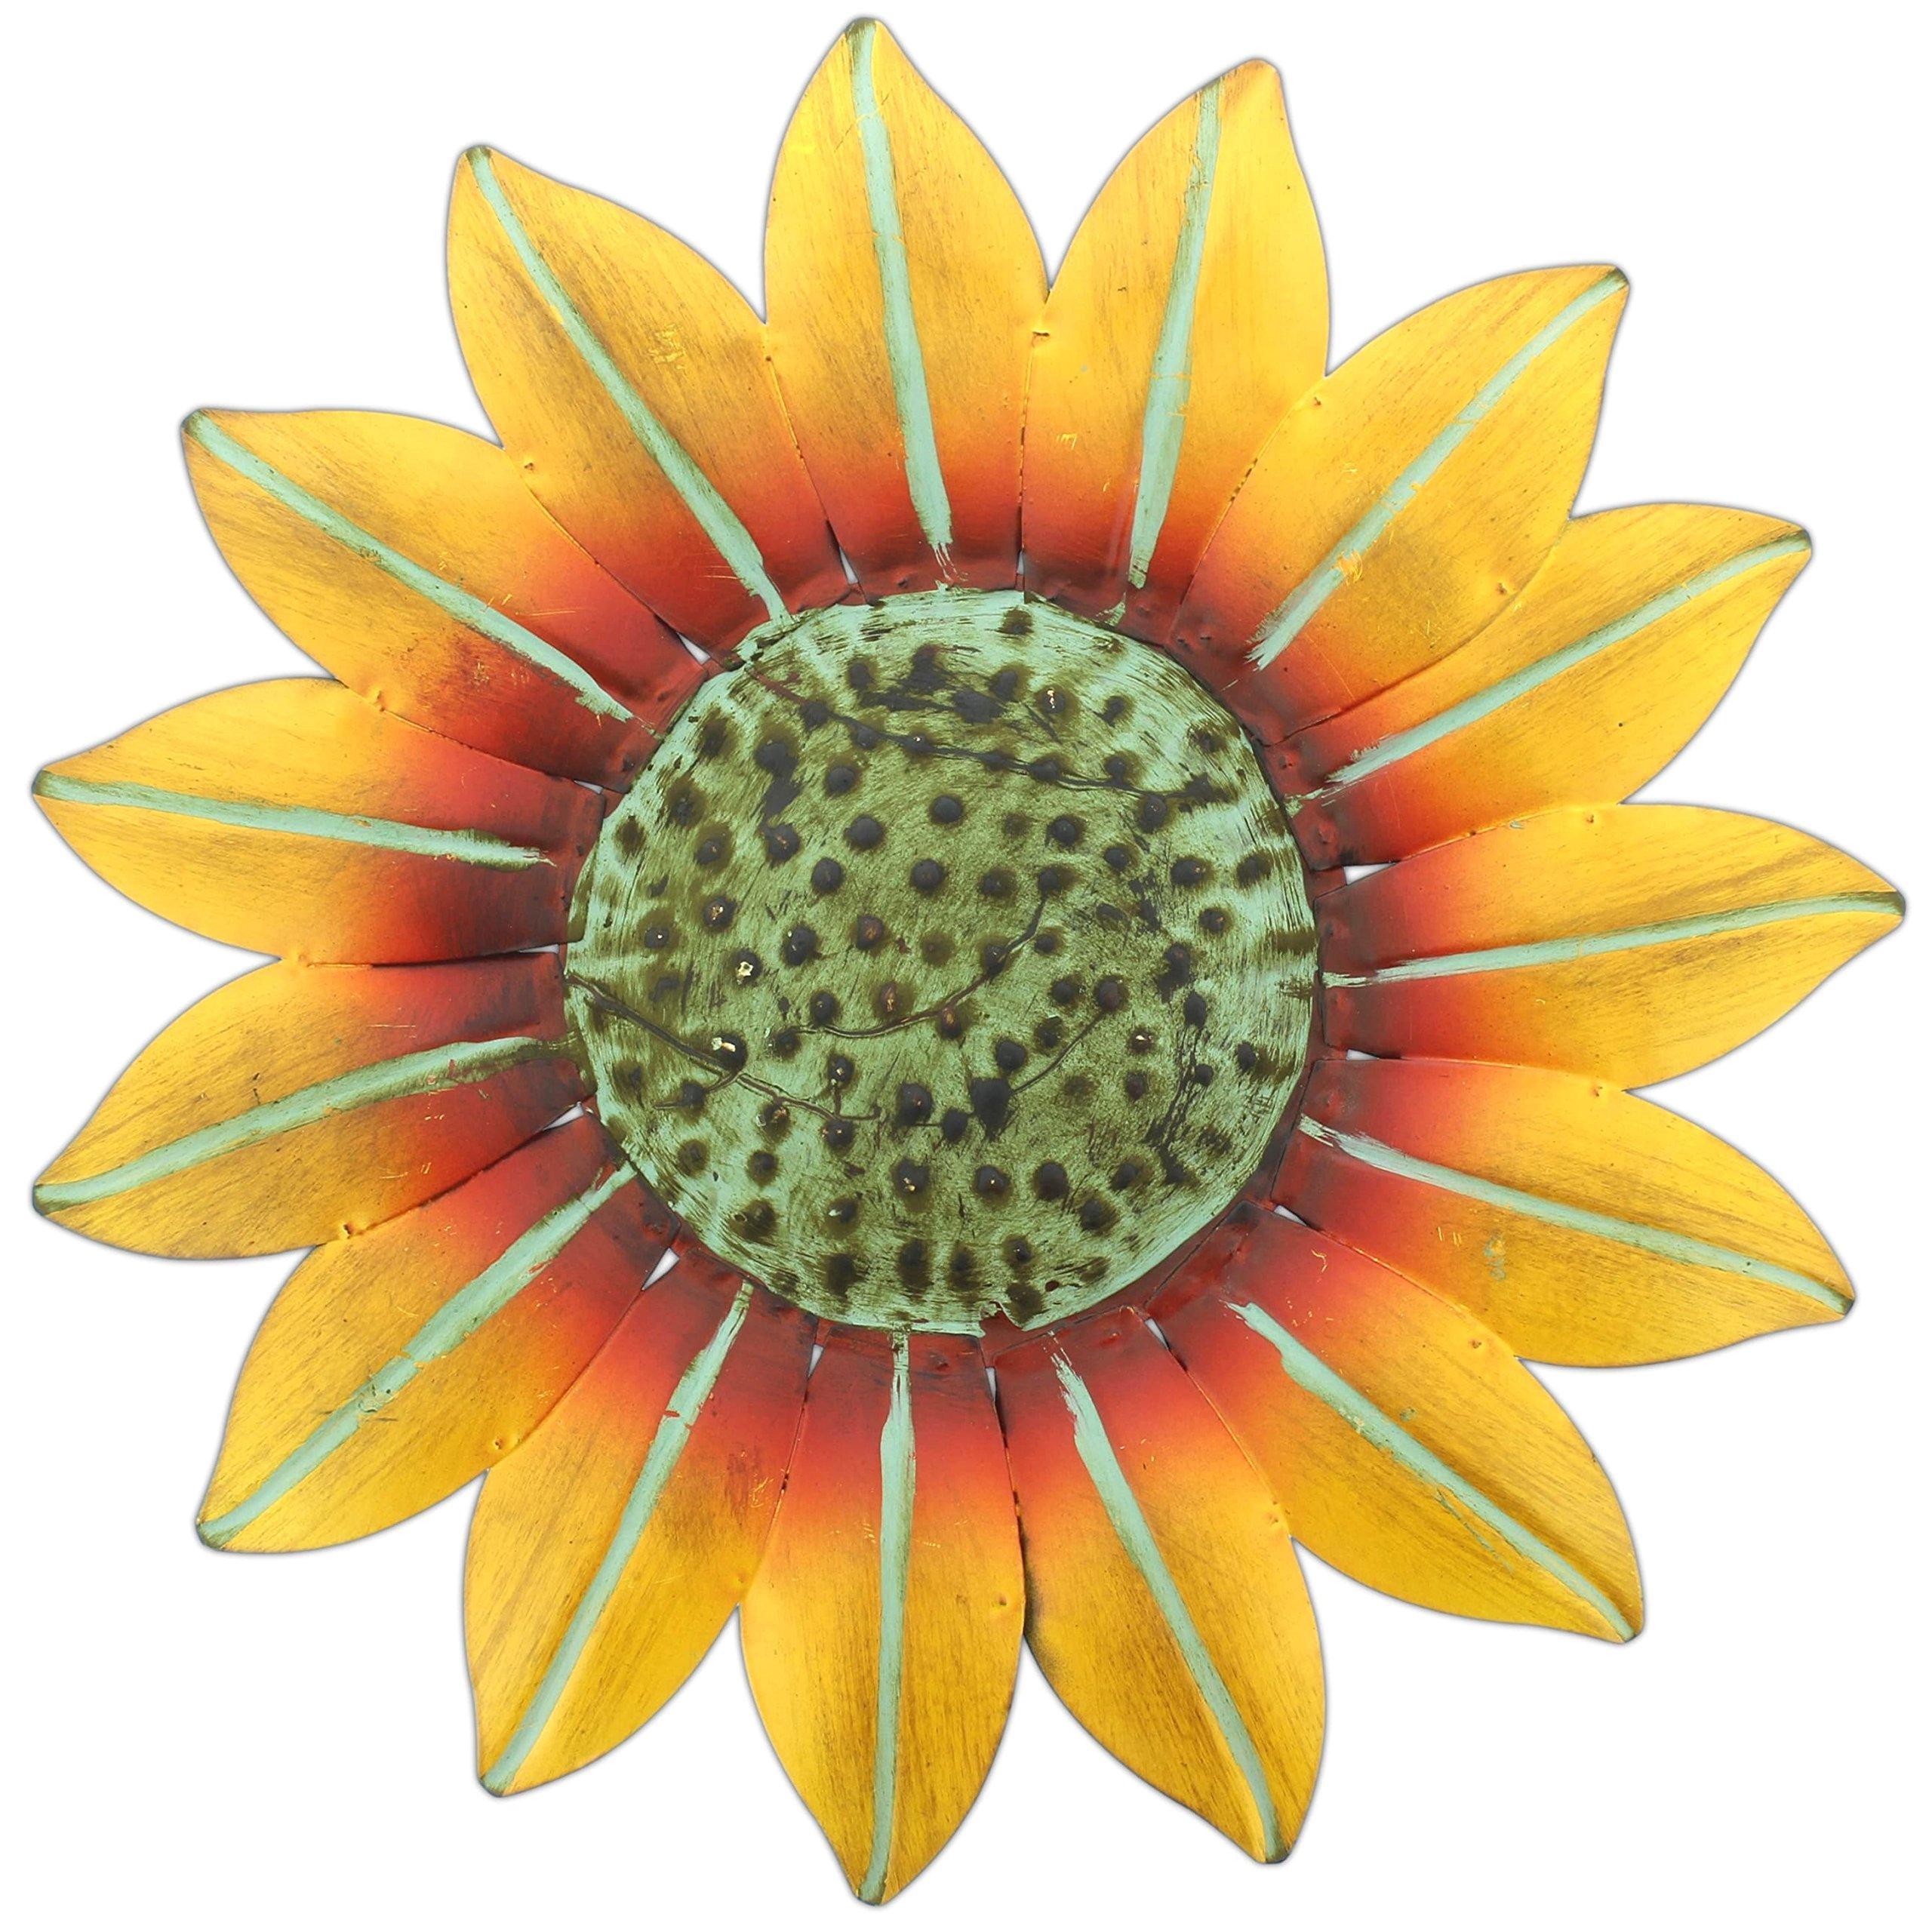 Mayrich 10'' Bright Yellow Metal Sunflower Wall Plaque Indoor/Outdoor Decor